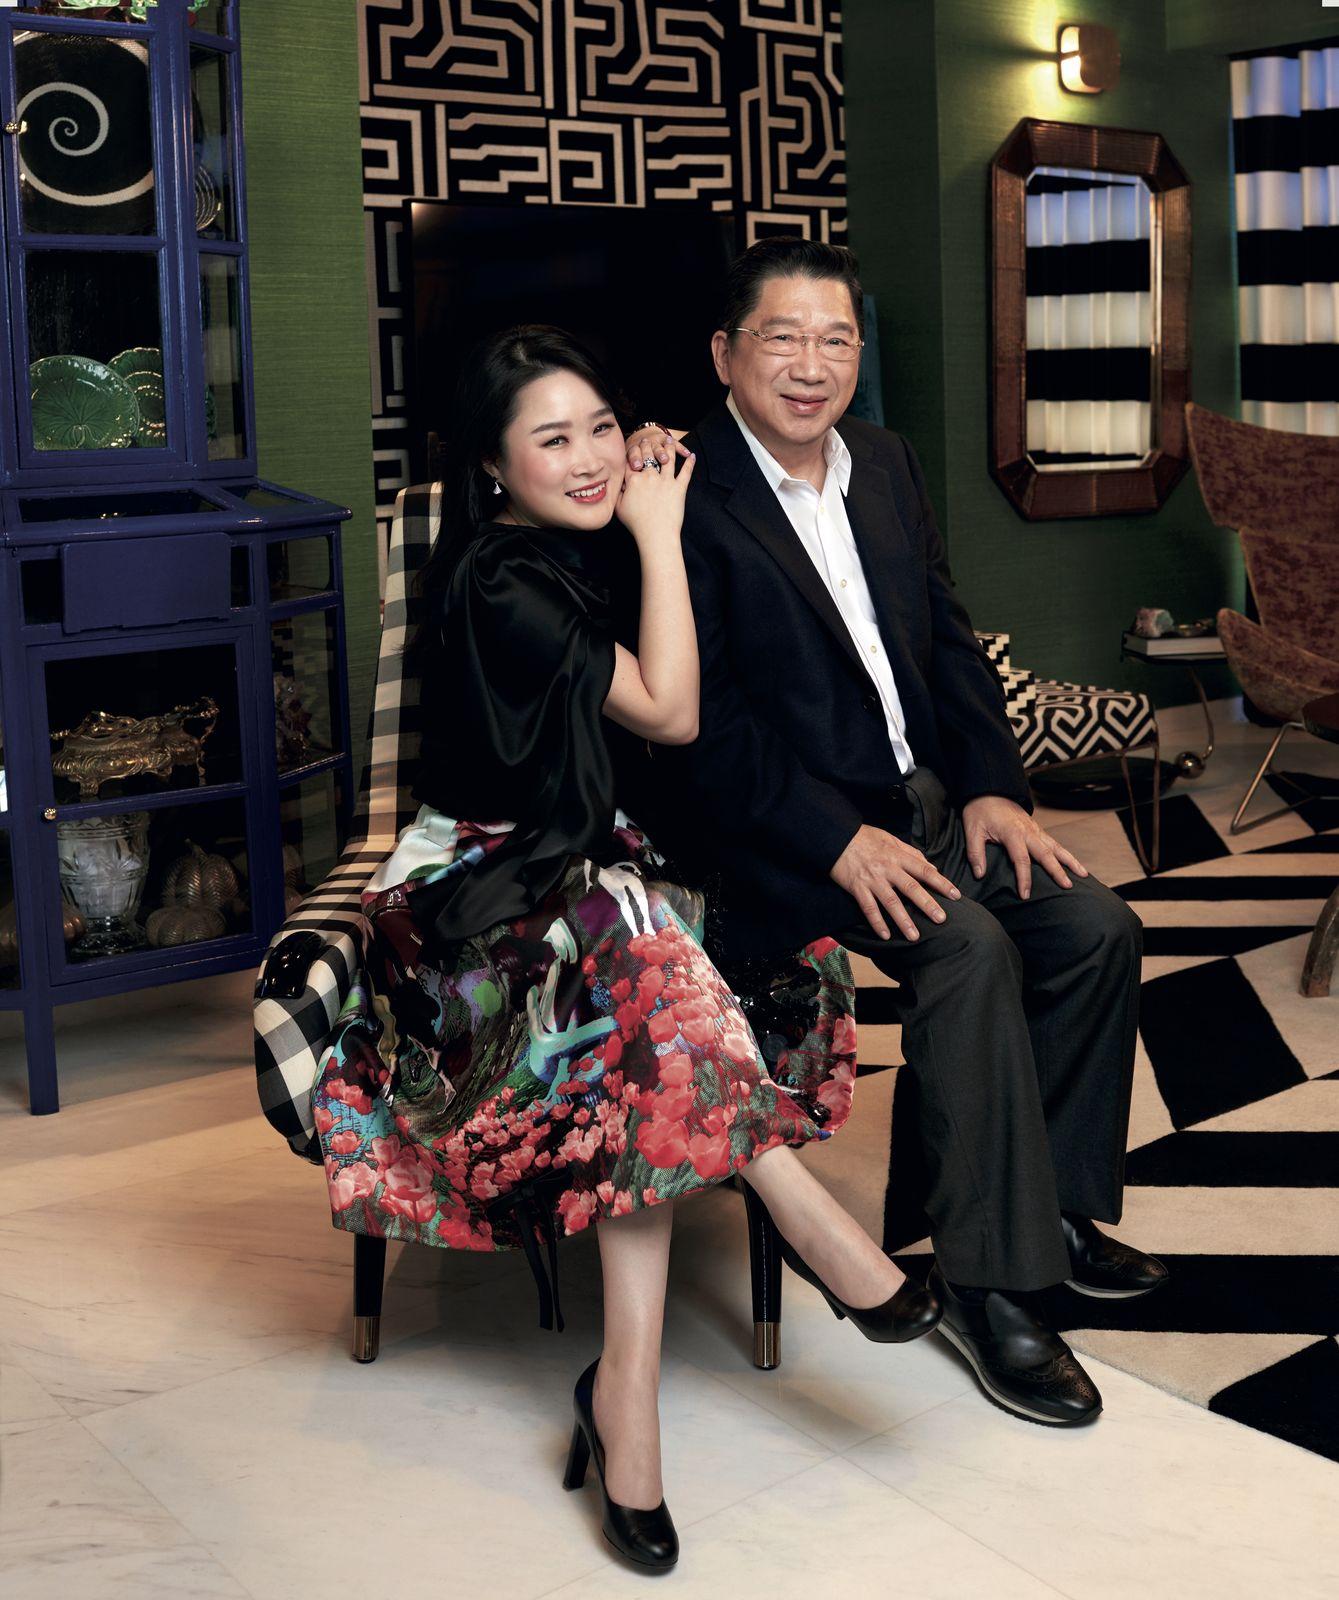 Lam Tong Loy and Lam Tze Tze